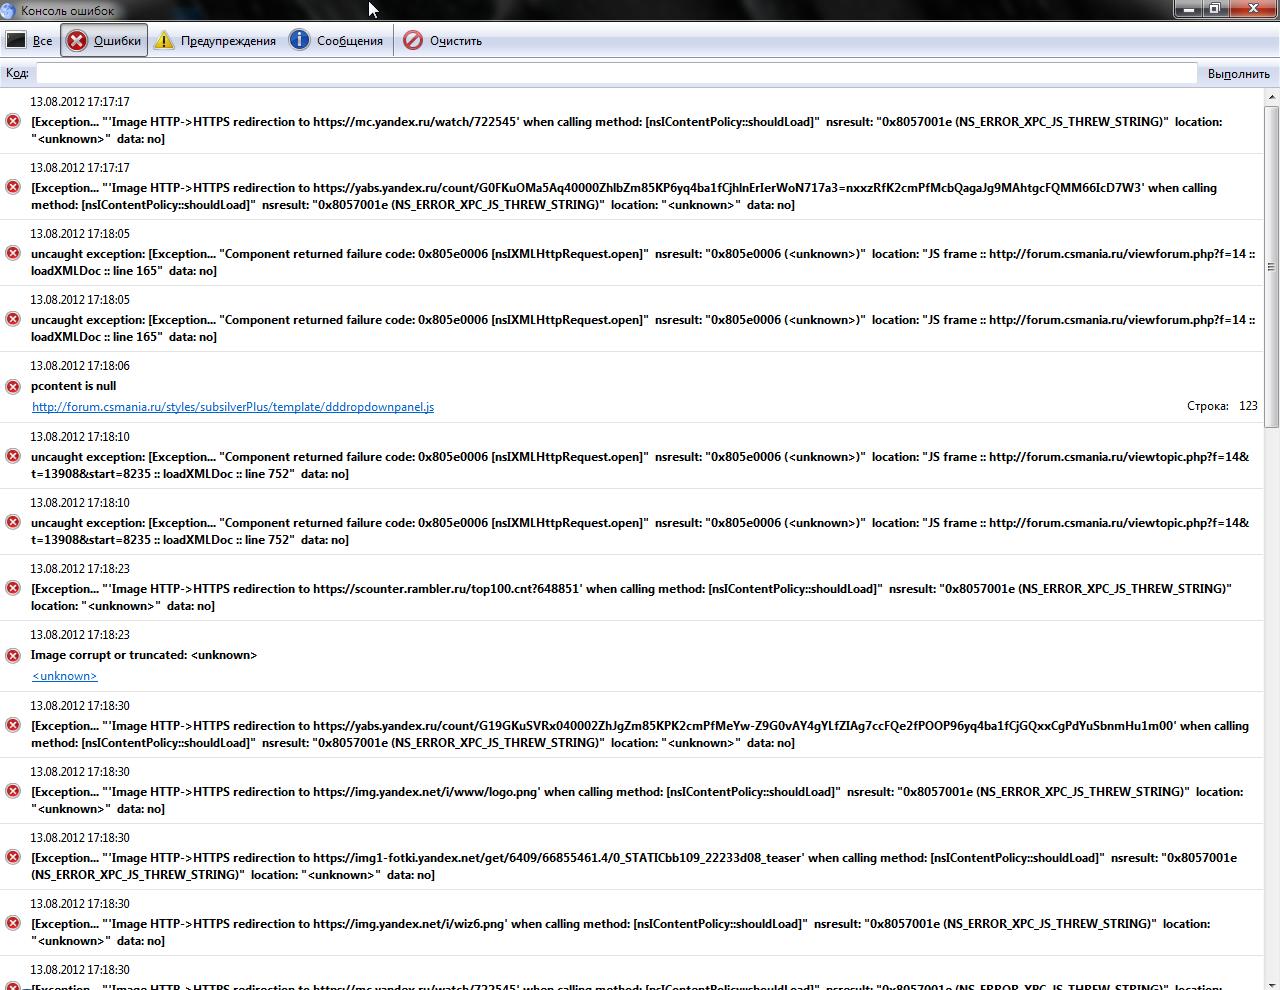 http://s2.hostingkartinok.com/uploads/images/2012/08/464153d63771c92bb2874b1829e16d3d.png